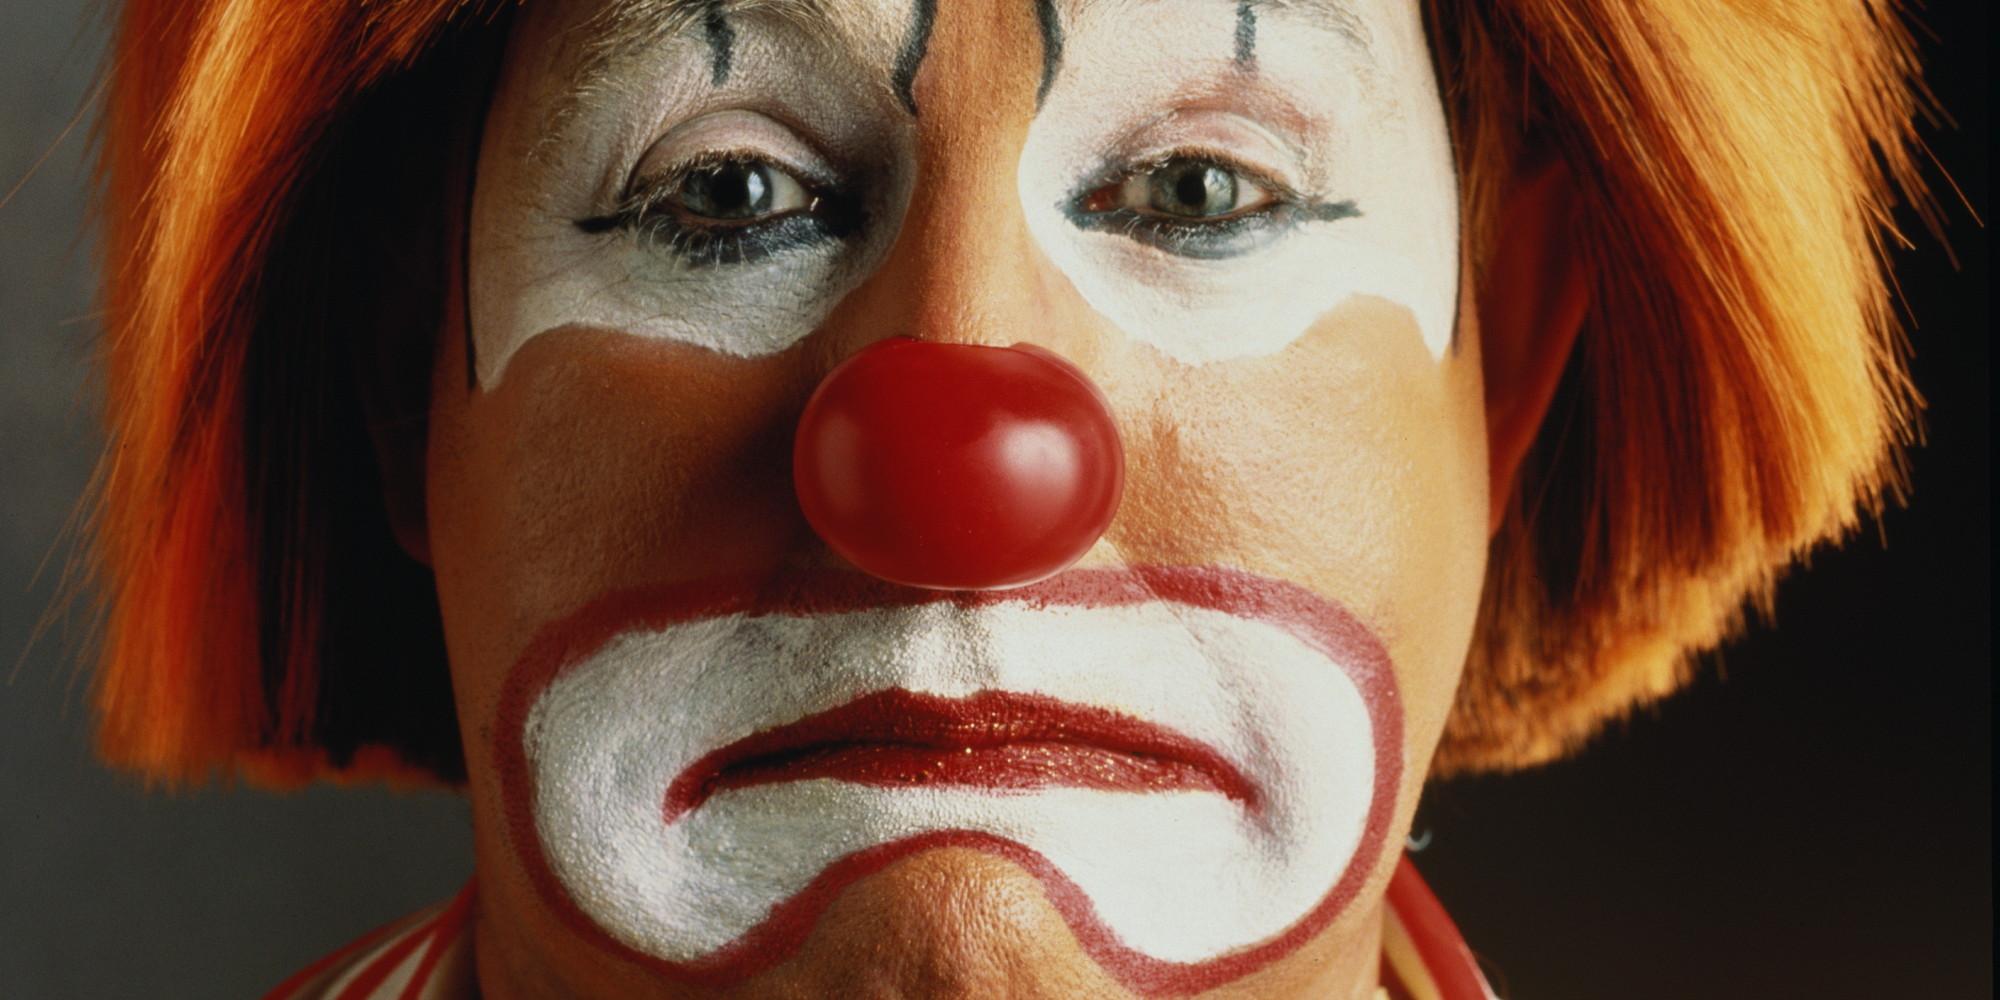 Famous Sad Clown Paintings Pictures